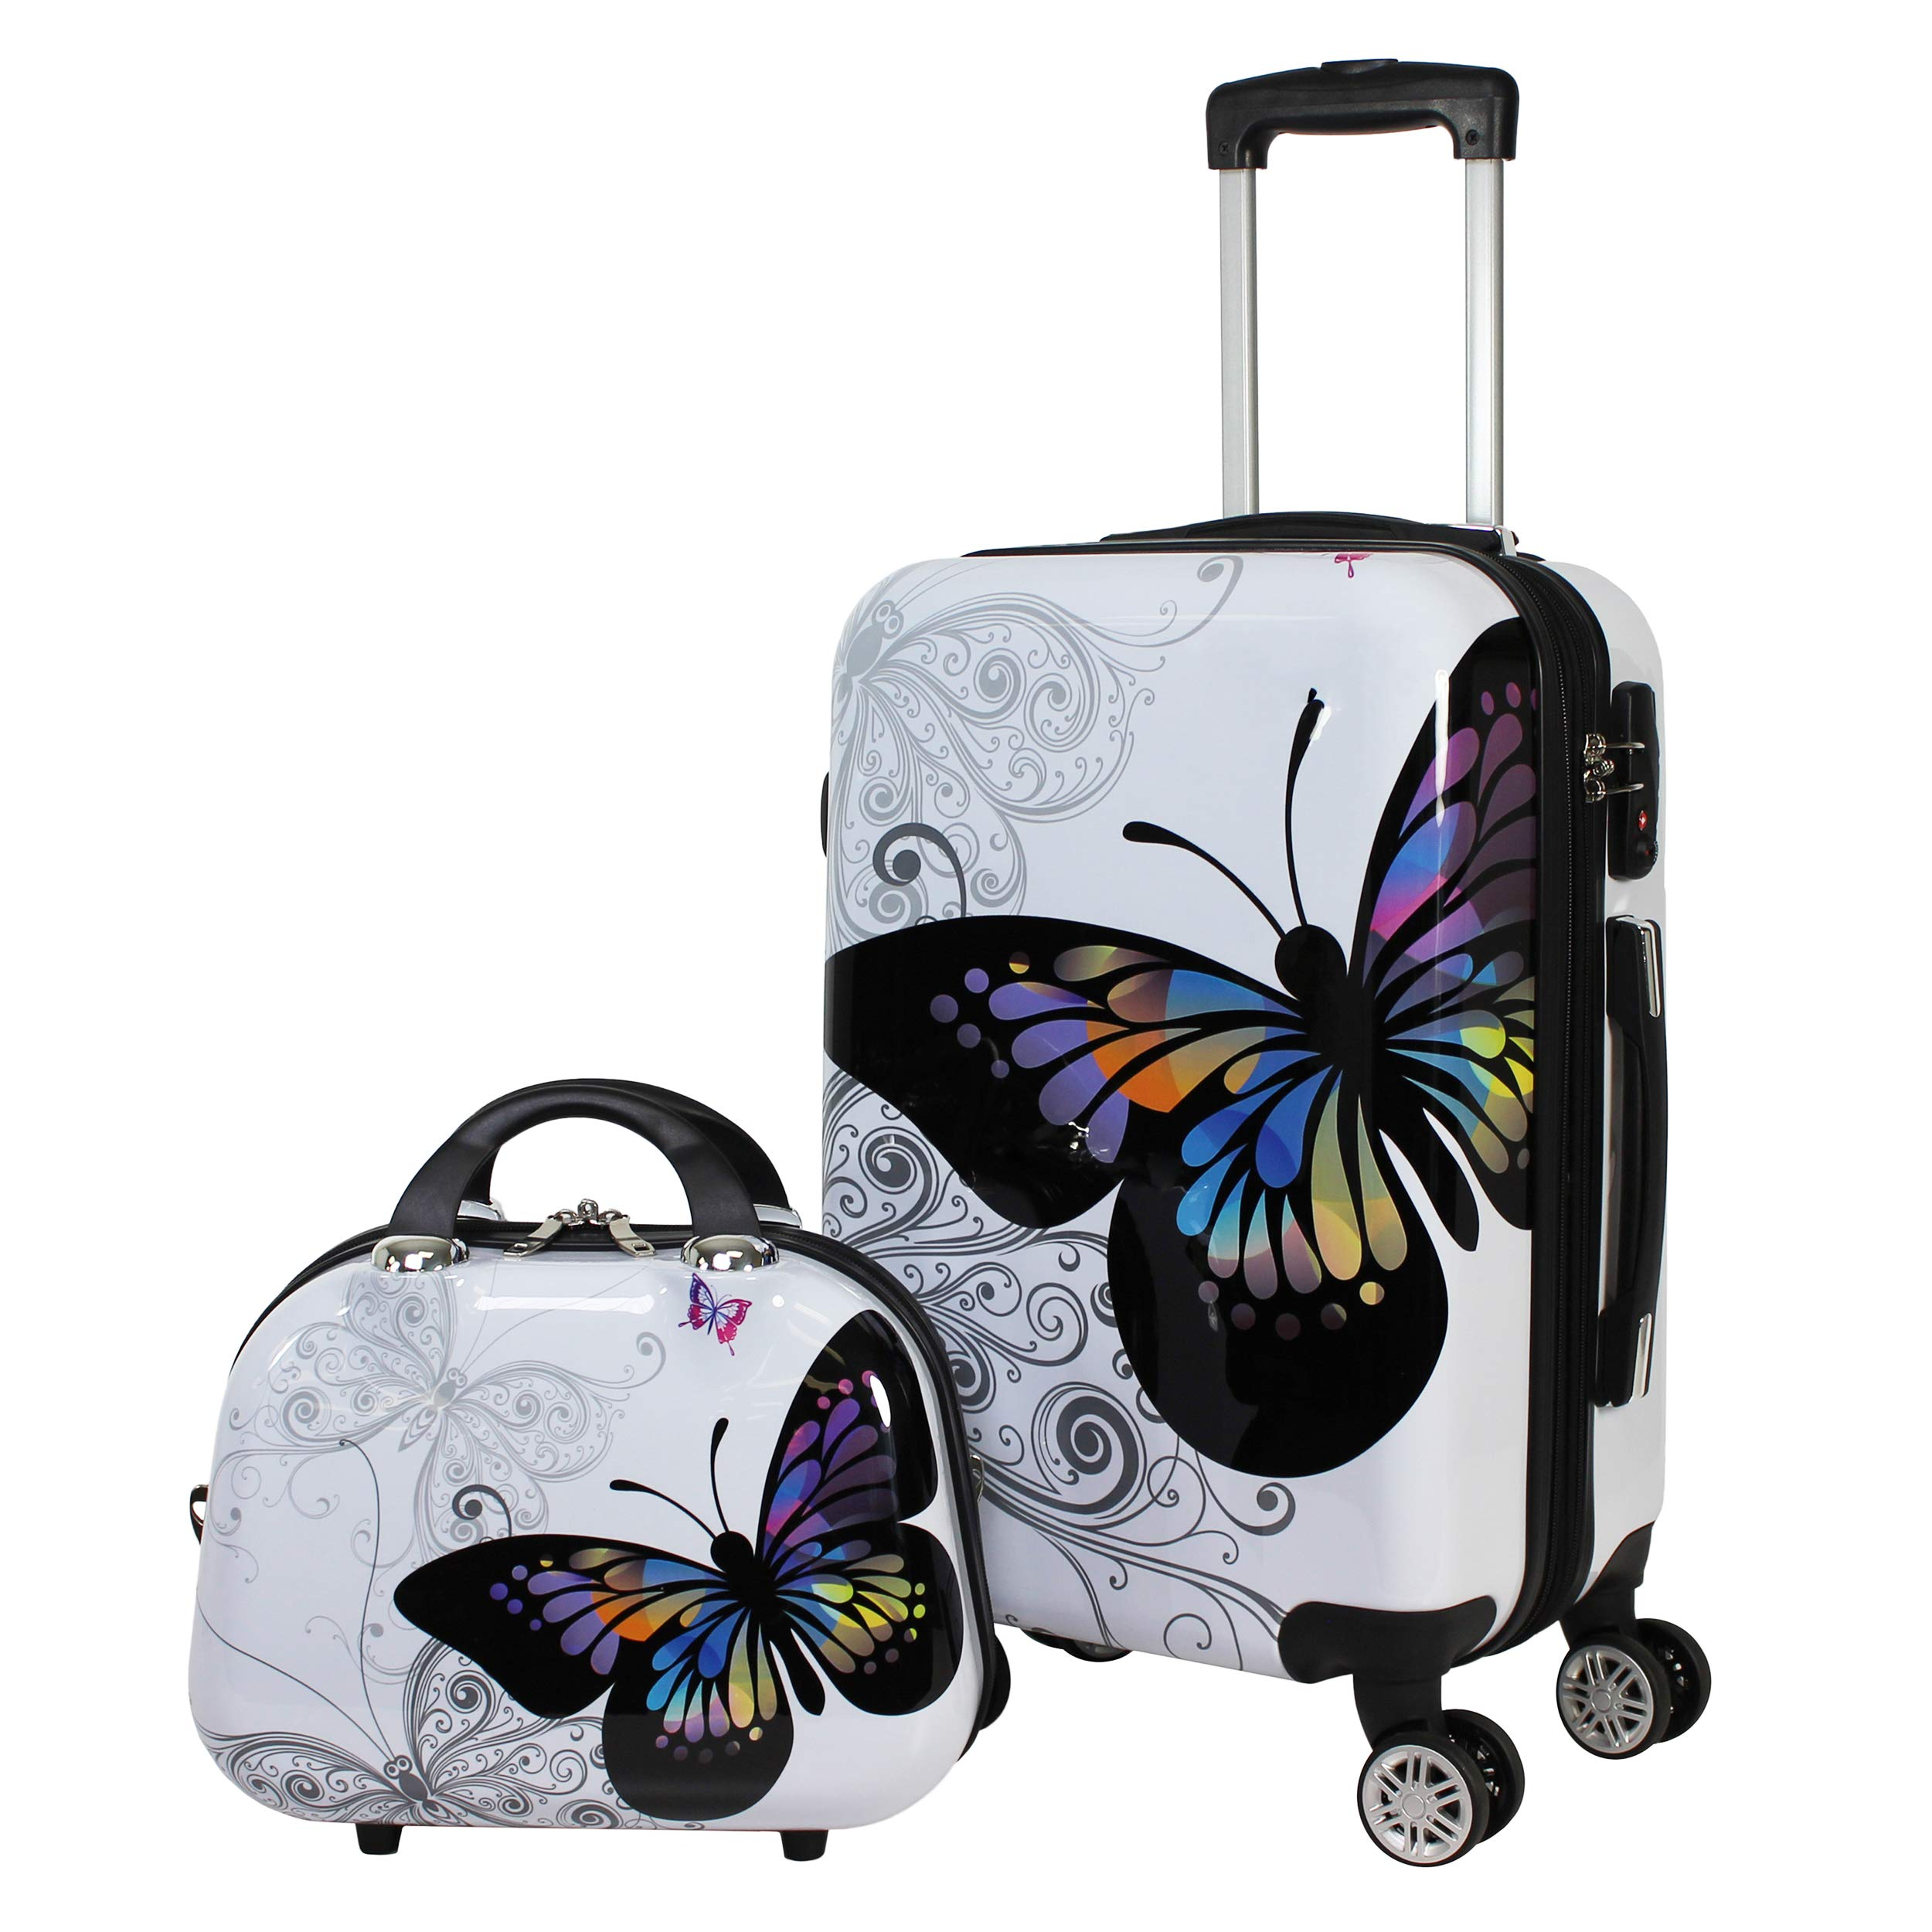 World Traveler 2-Piece Hardside Upright Spinner Luggage Set, Butterfly by World Traveler